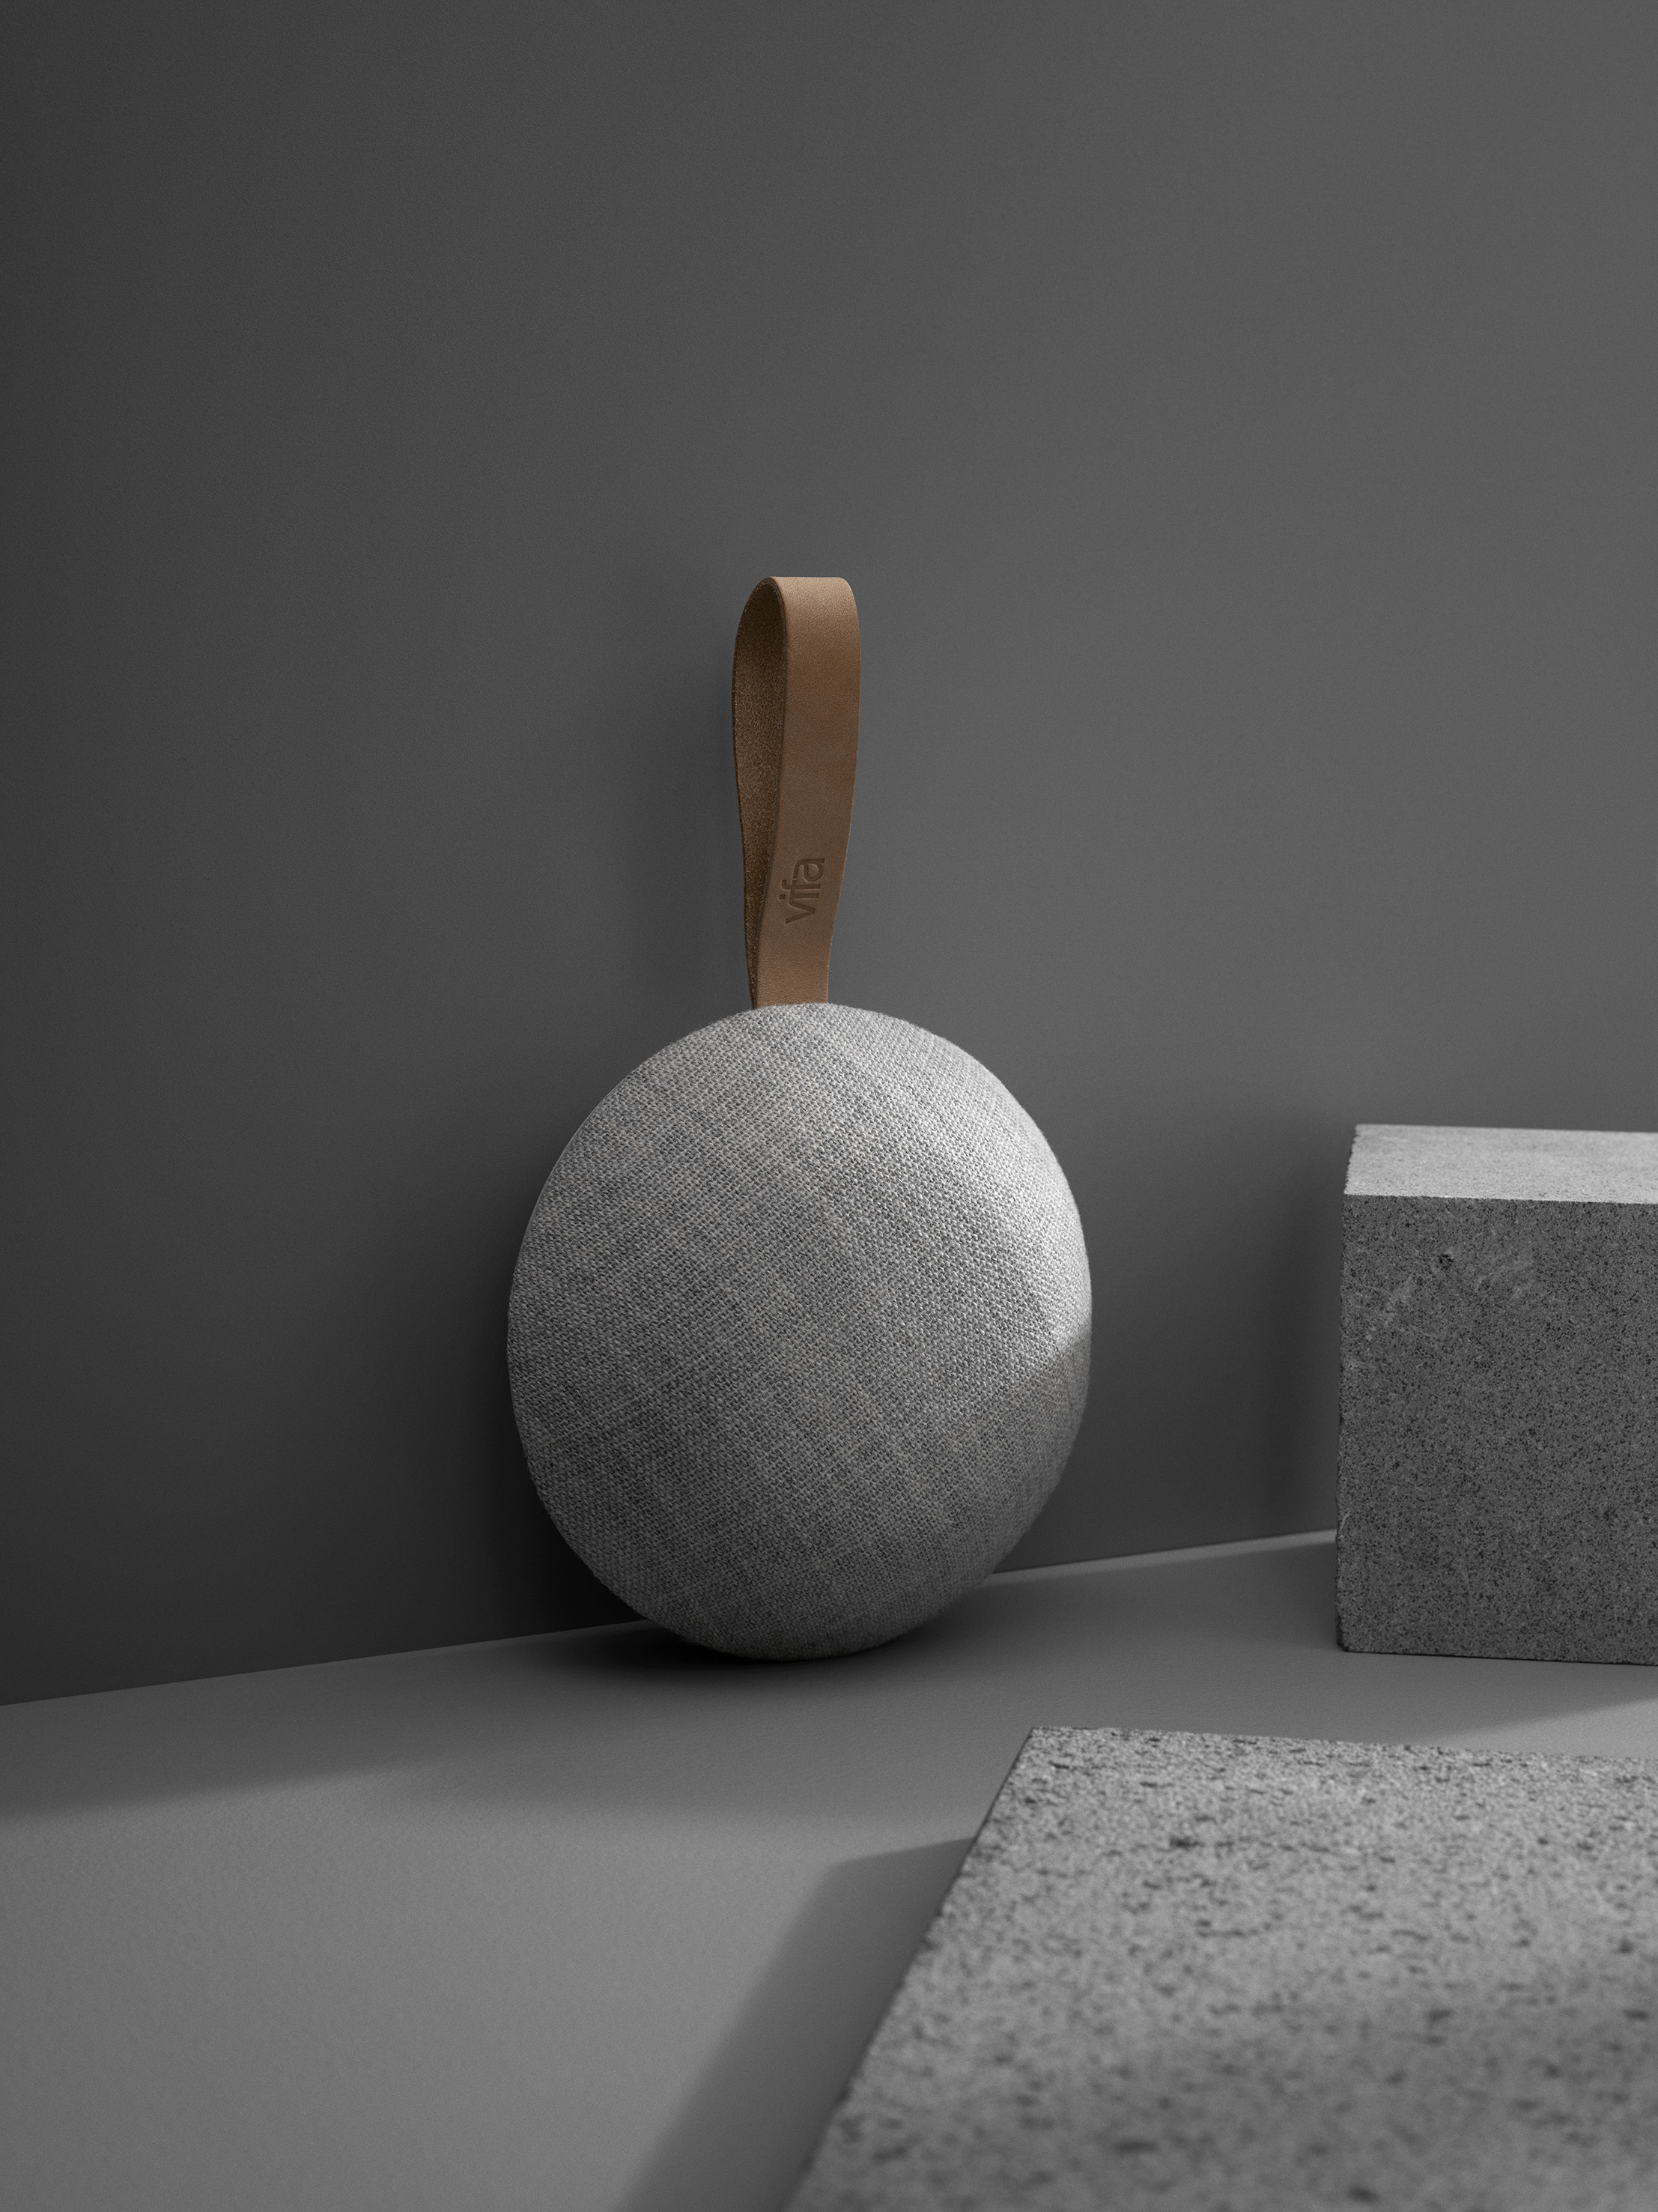 vifa_reykjavik_sandstone_grey_193812.jpg